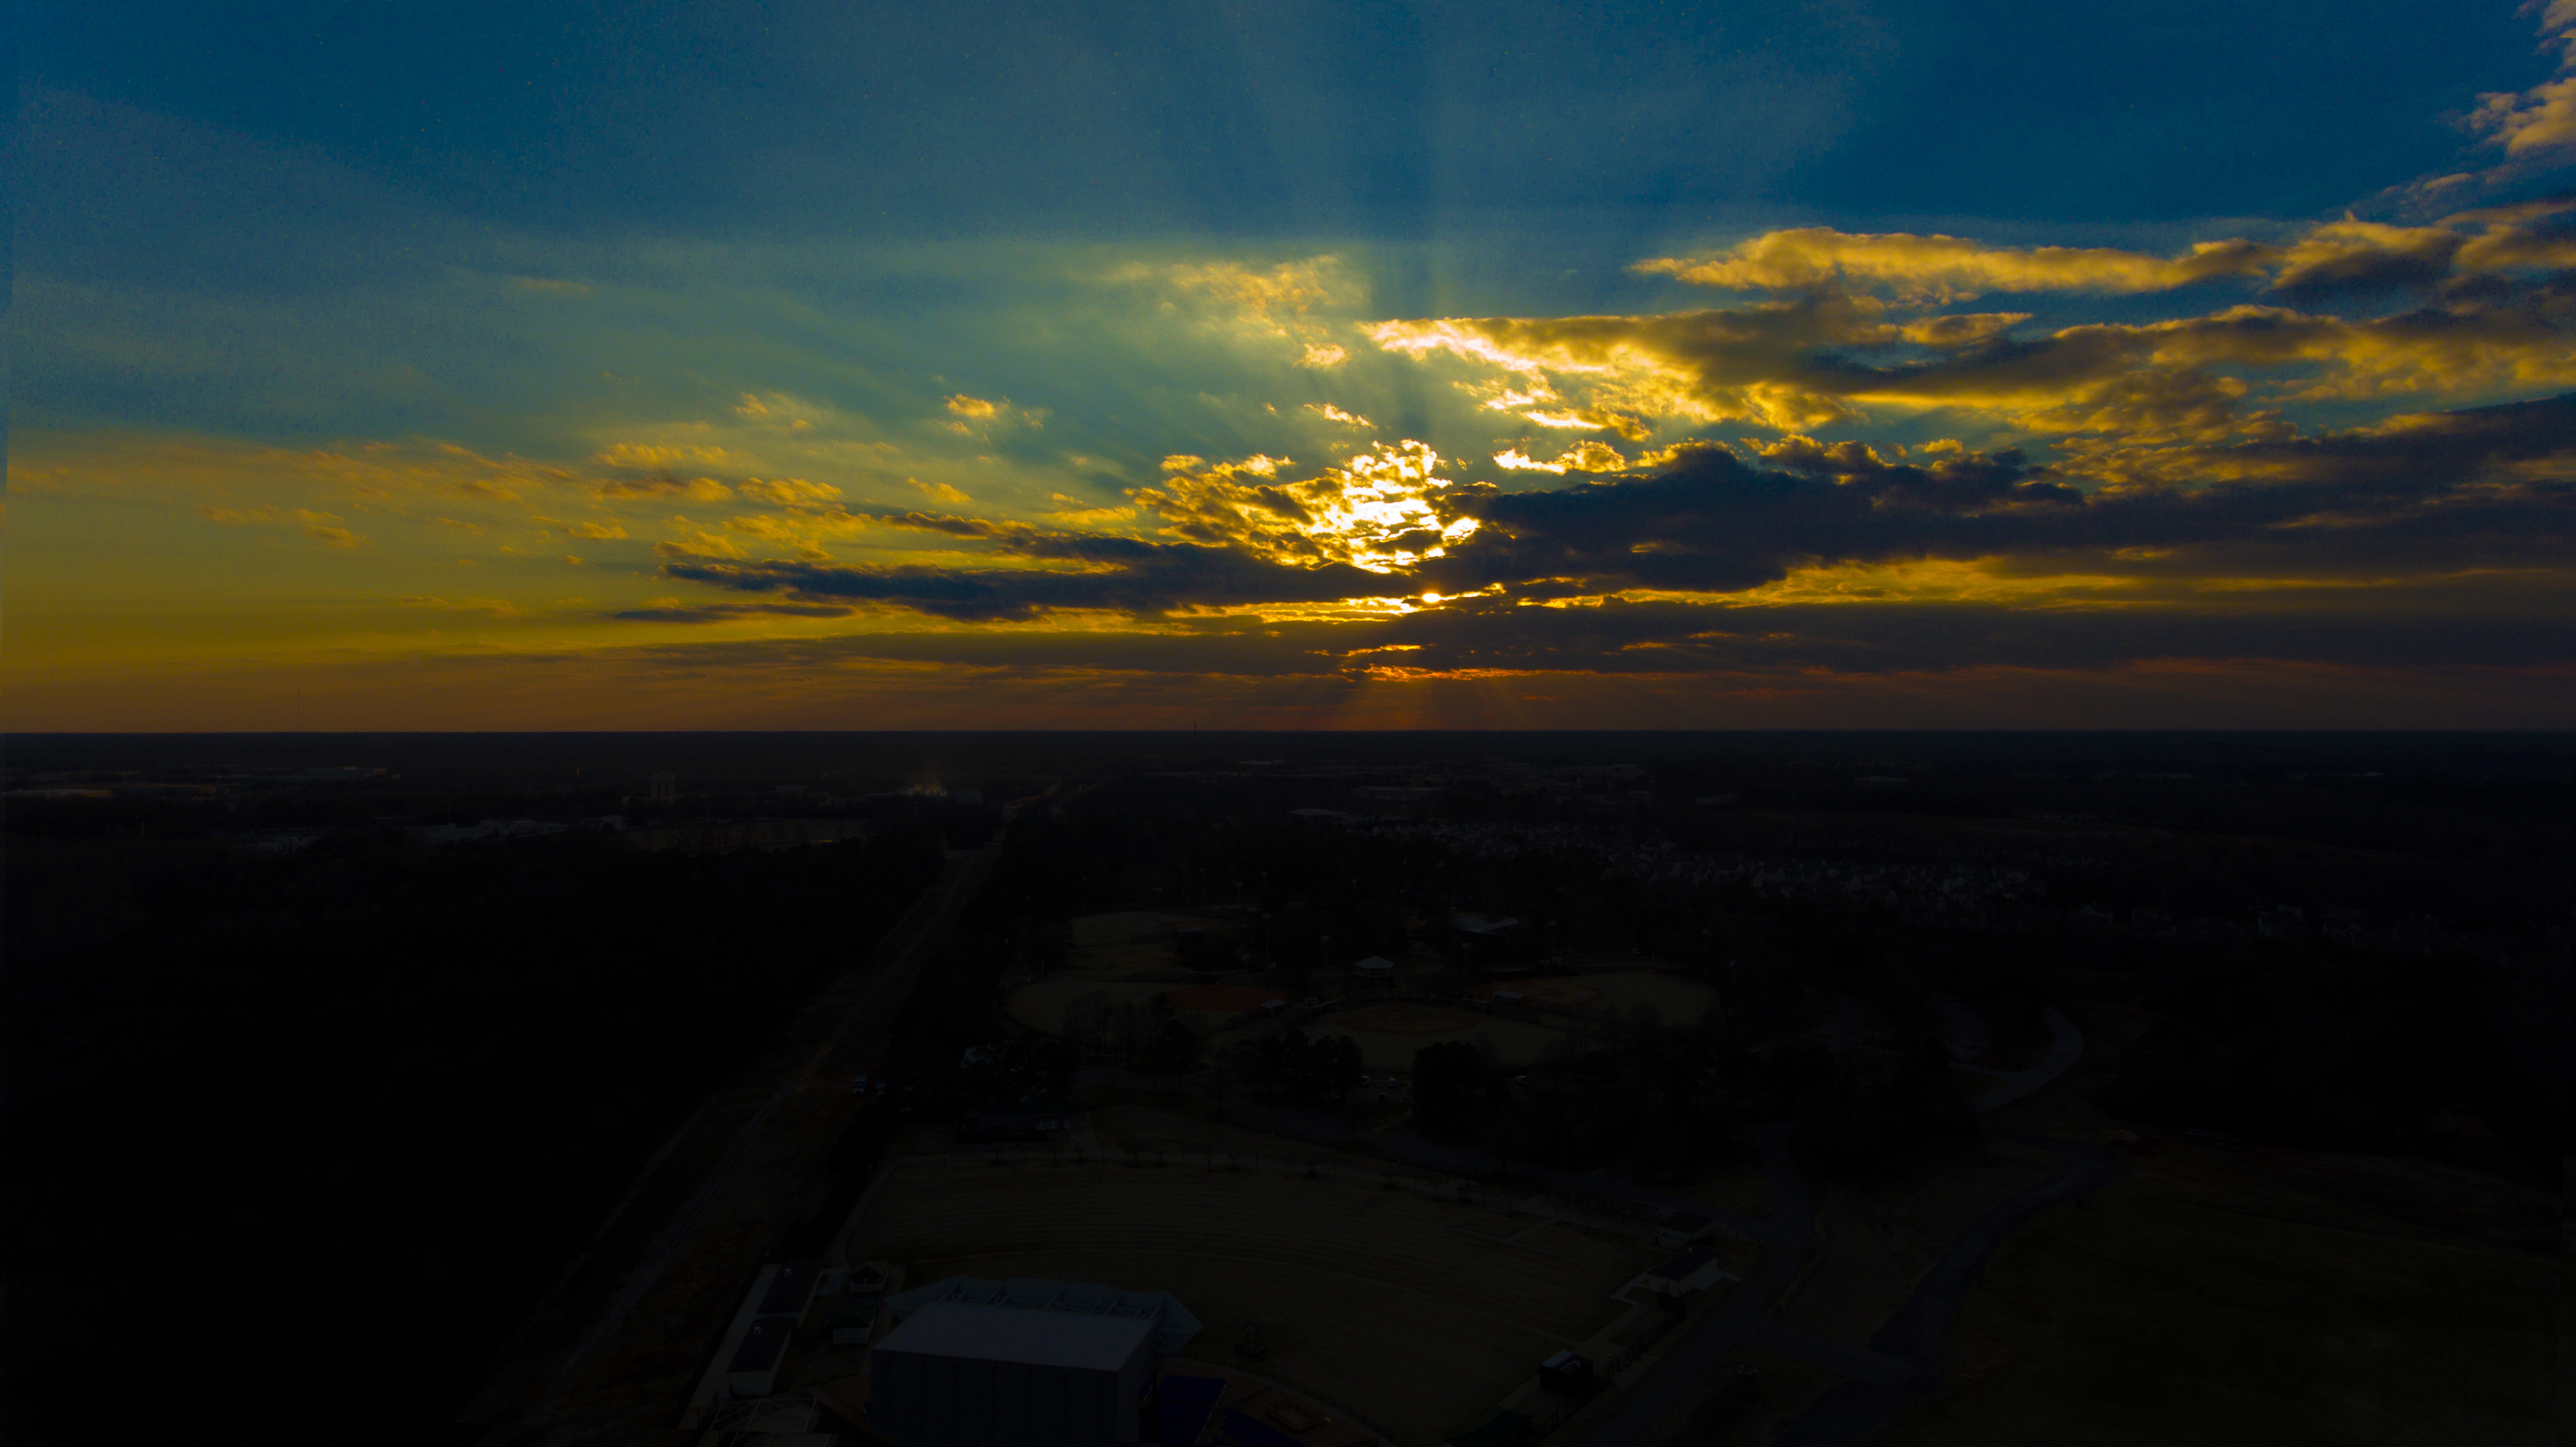 Sunset at Heritage Park